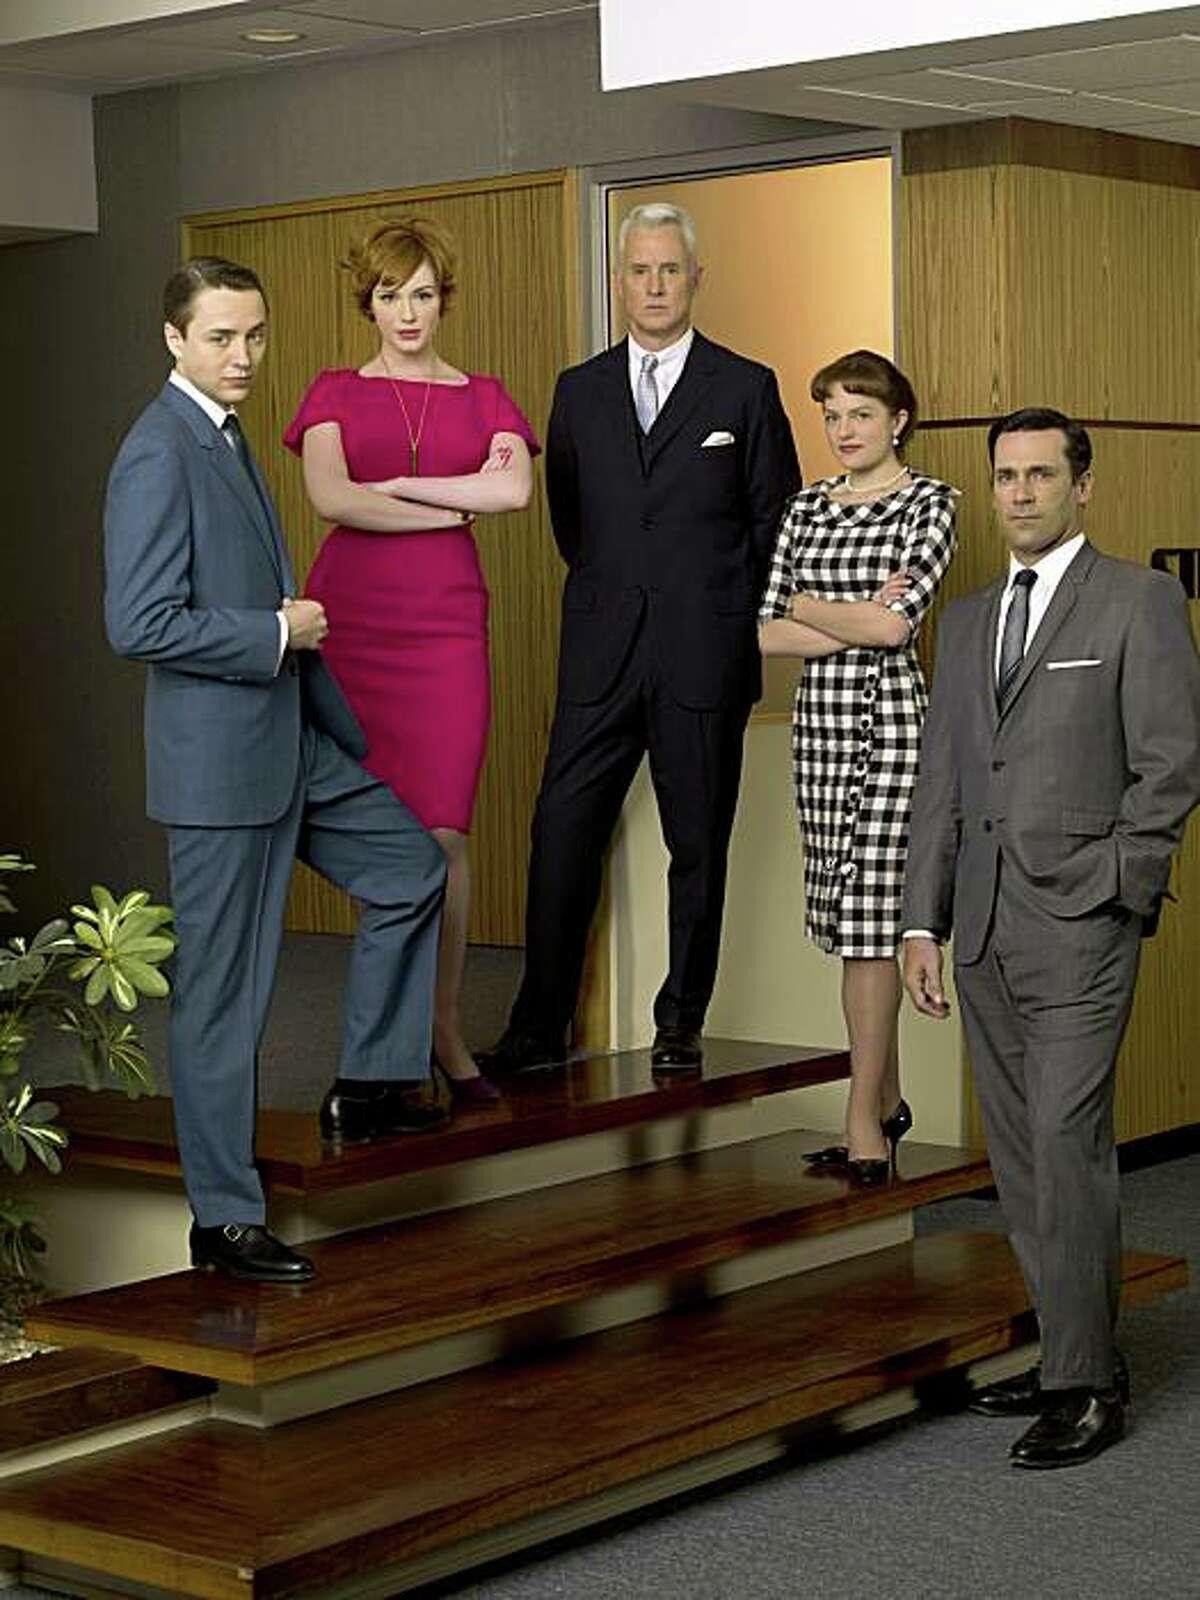 AMC Mad Men cast shot at the Sterling Cooper office: Pete Campbell (Vincent Kartheiser), Joan Holloway (Christina Hendricks), Roger Sterling (John Slattery), Peggy Olson (Elisabeth Moss), Don Draper (Jon Hamm).